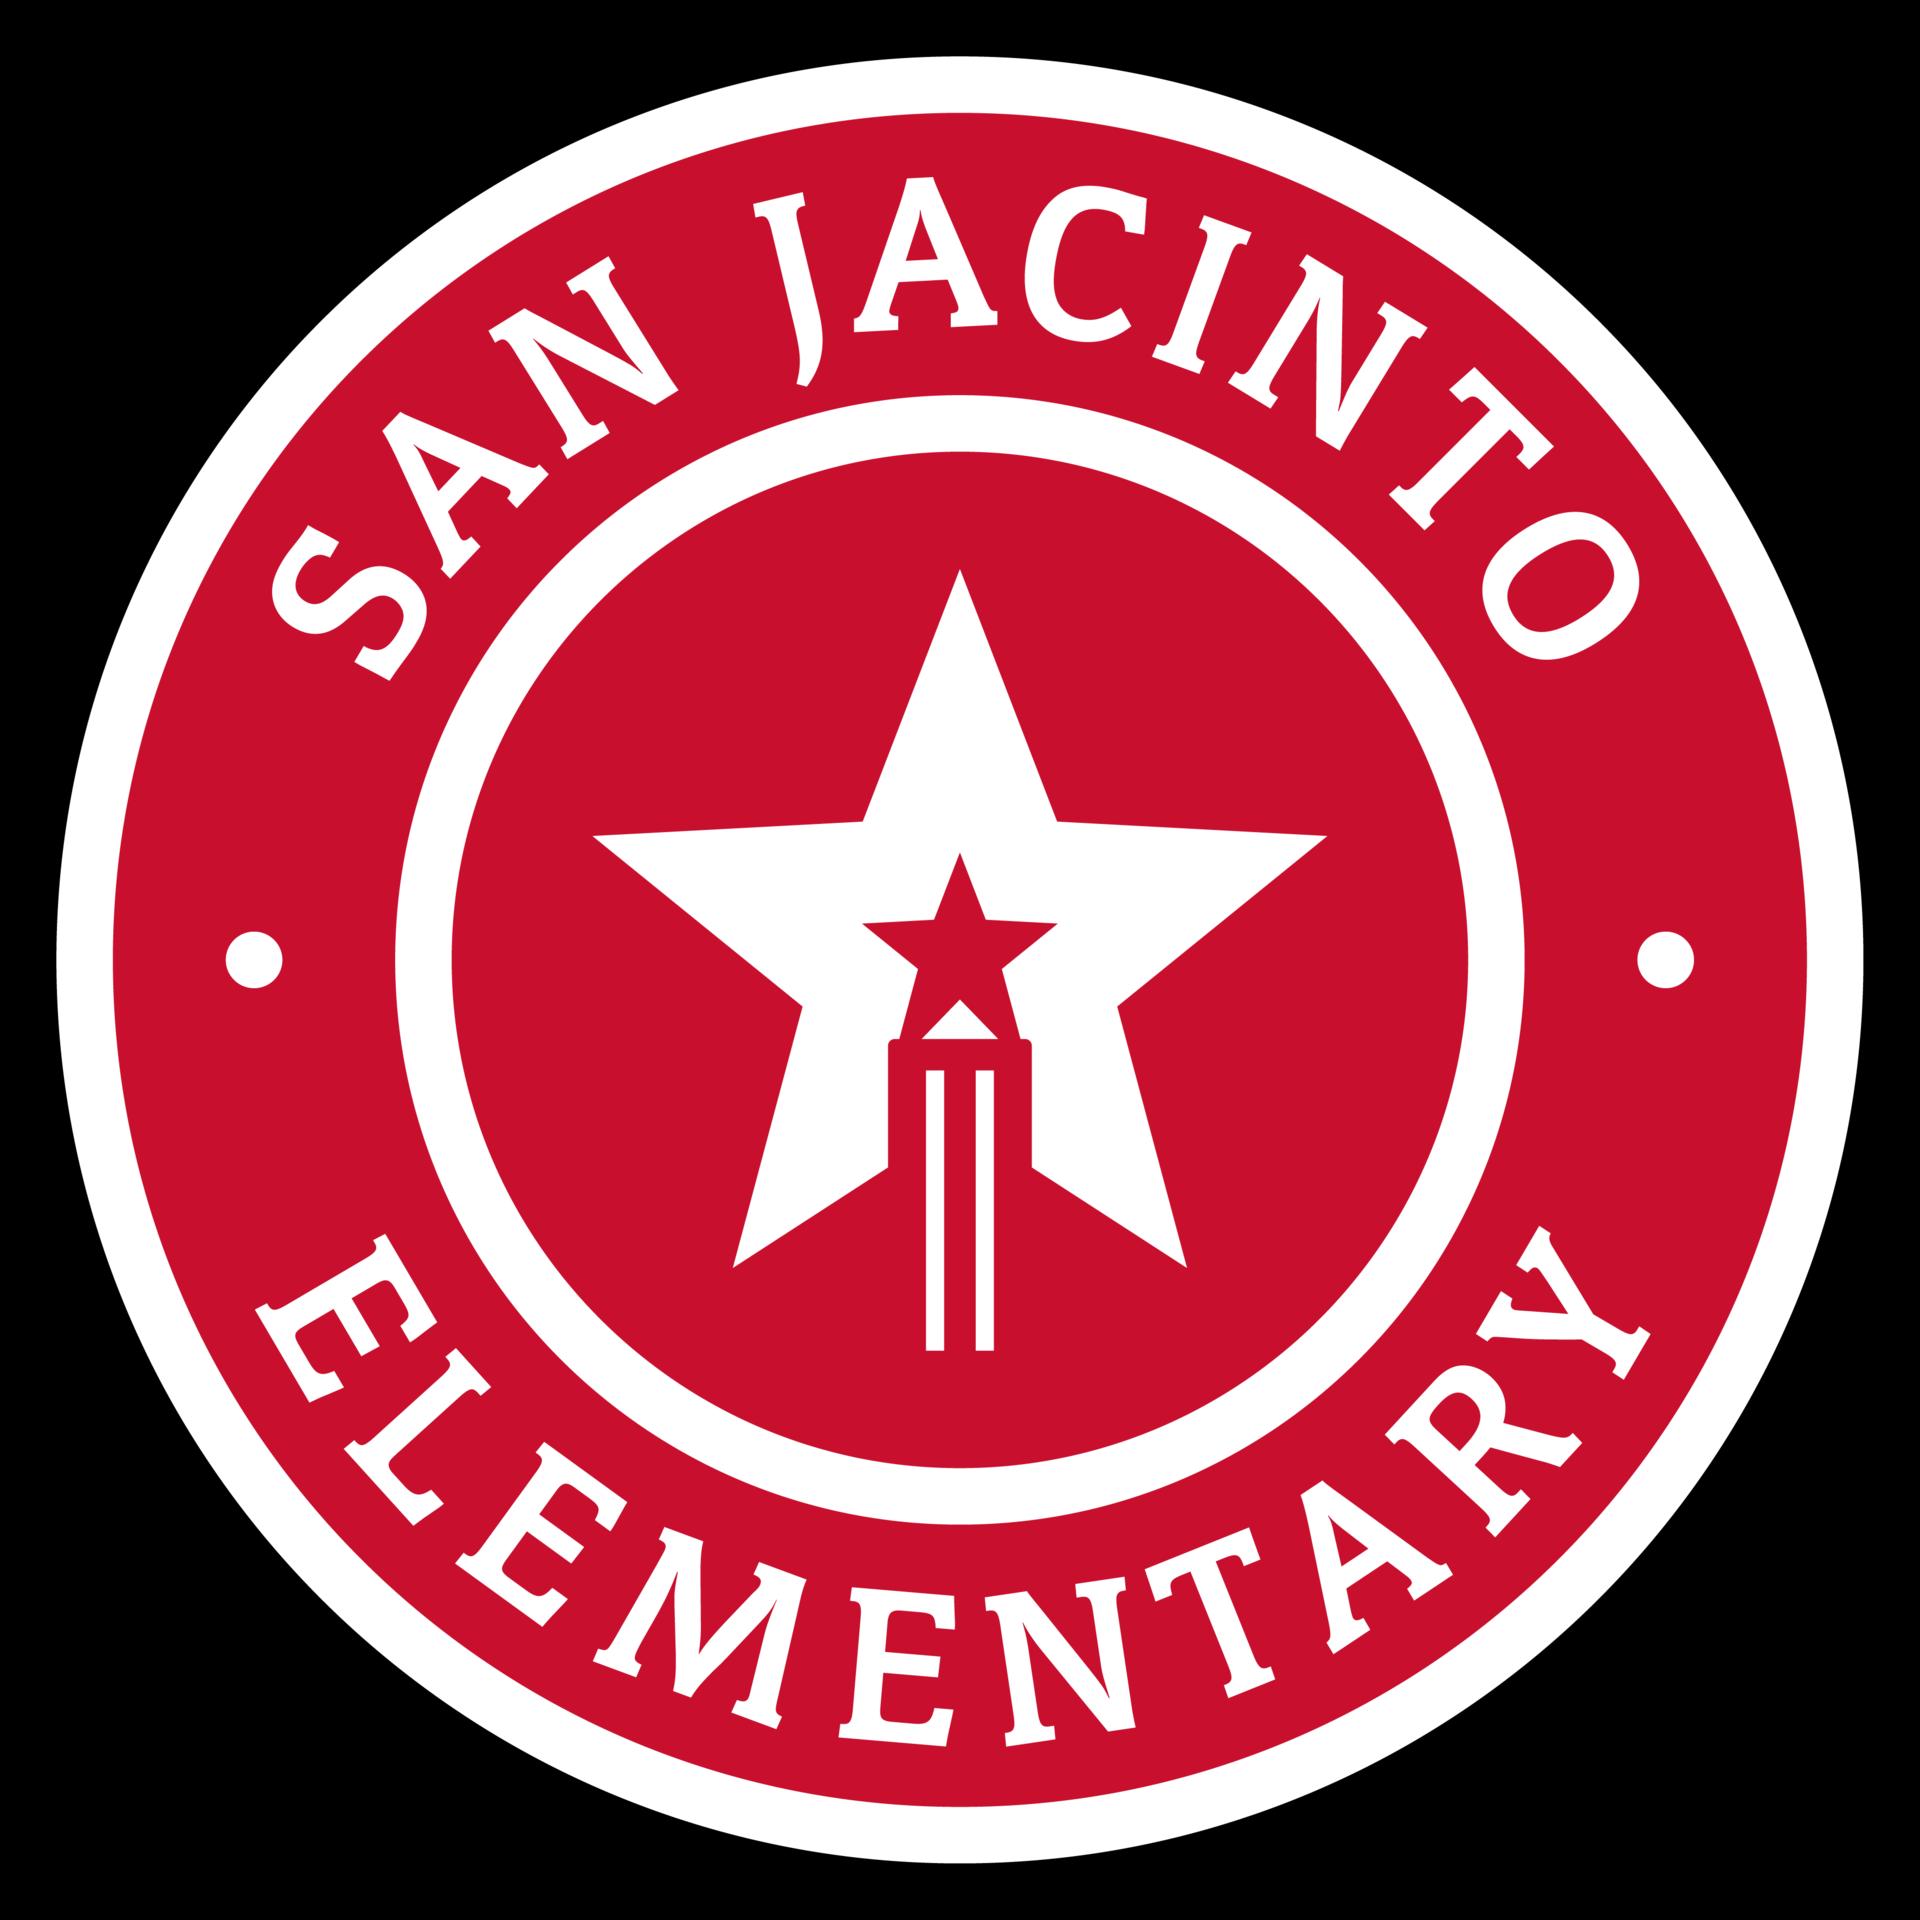 San Jacinto Elementary school seal